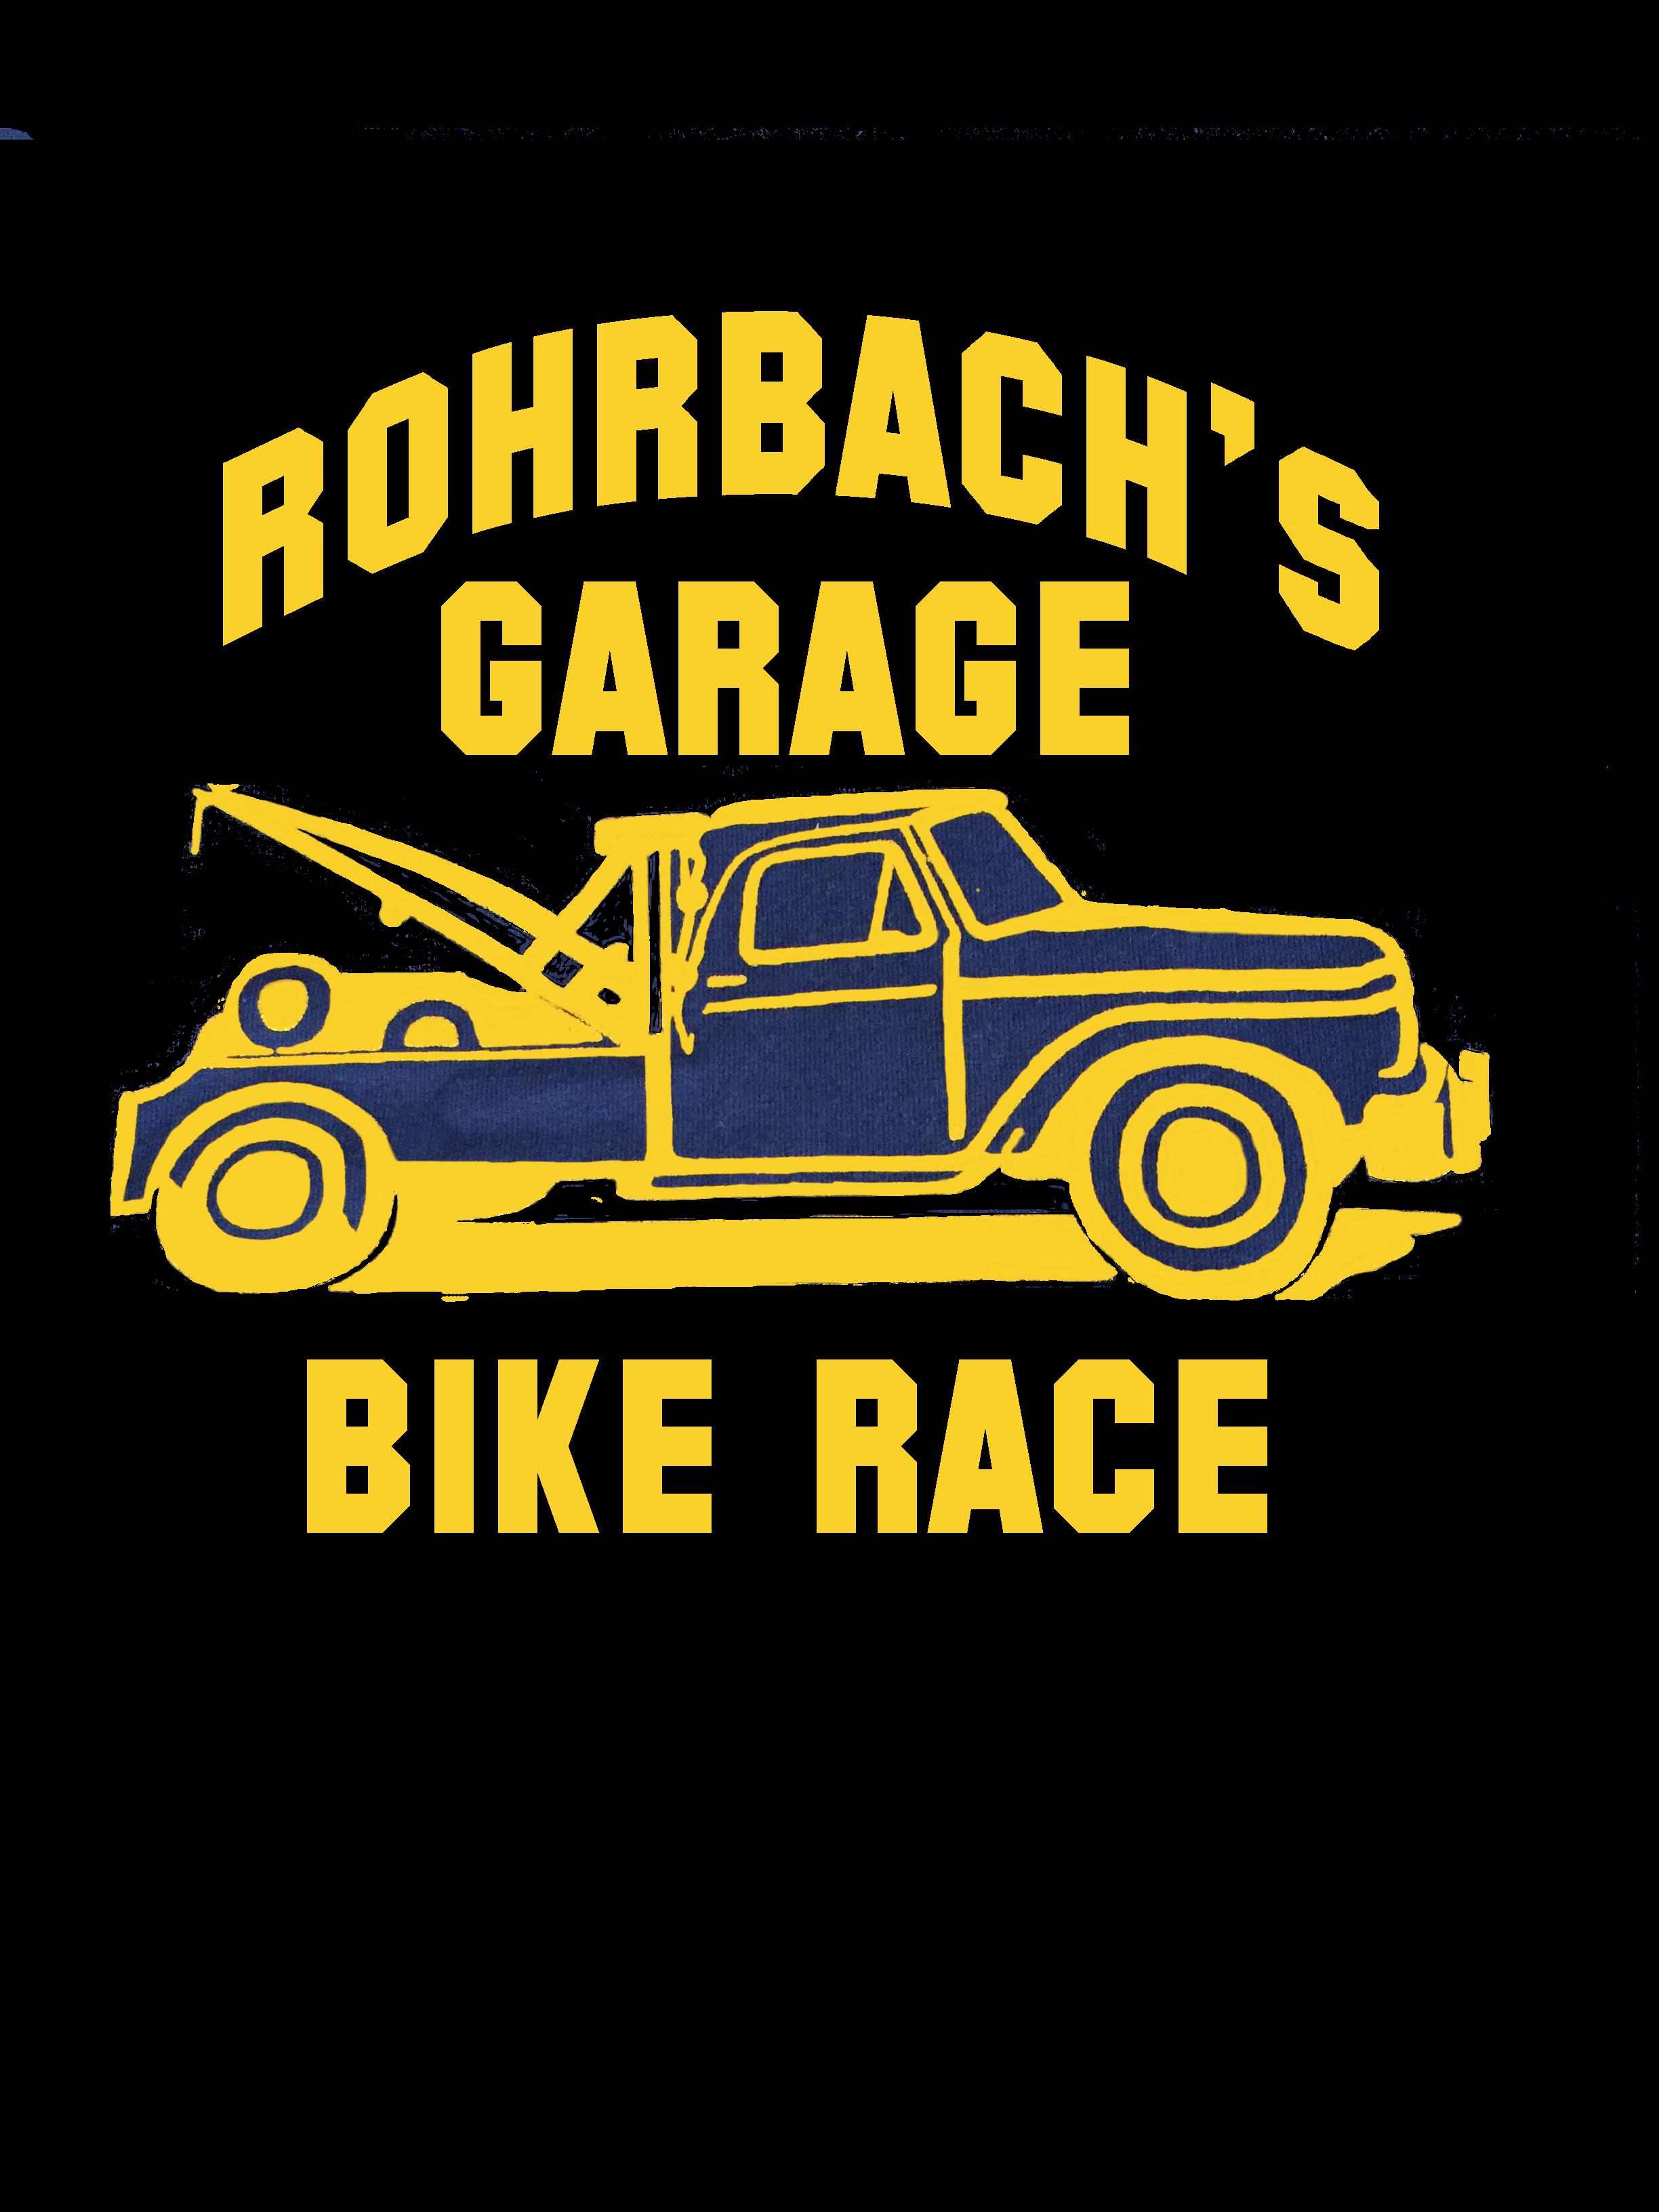 Rorhbach's Garage5.png